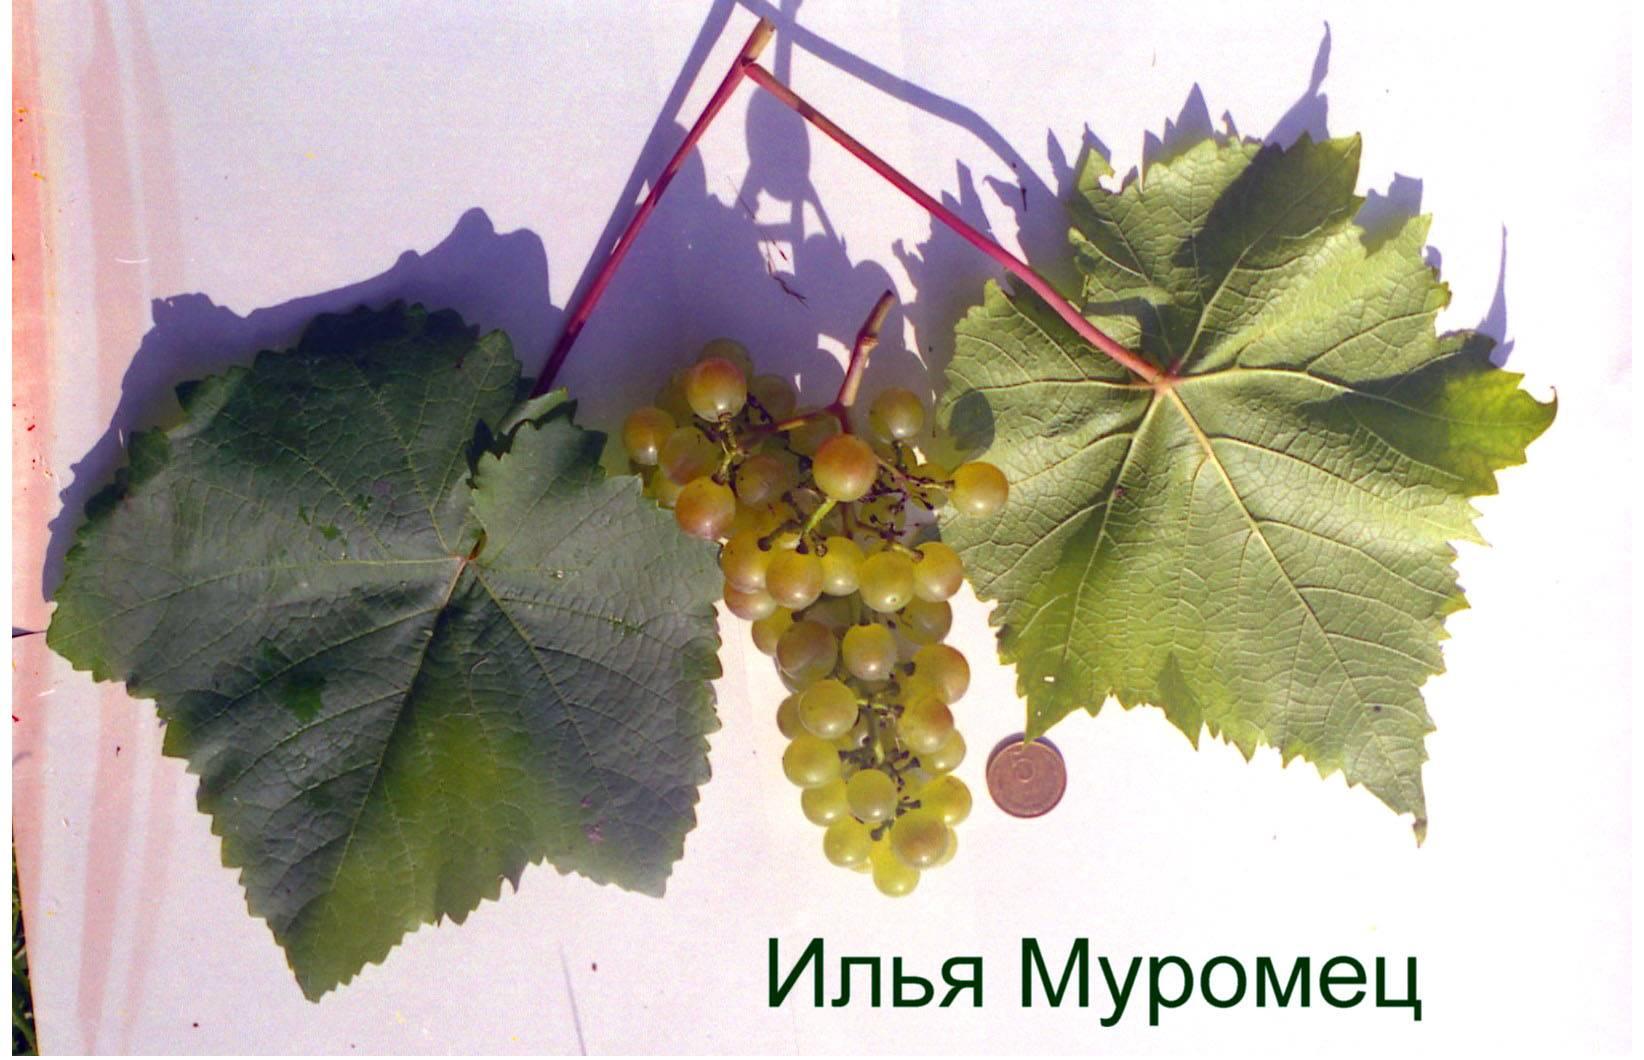 Виноград муромец: характеристика и описание сорта